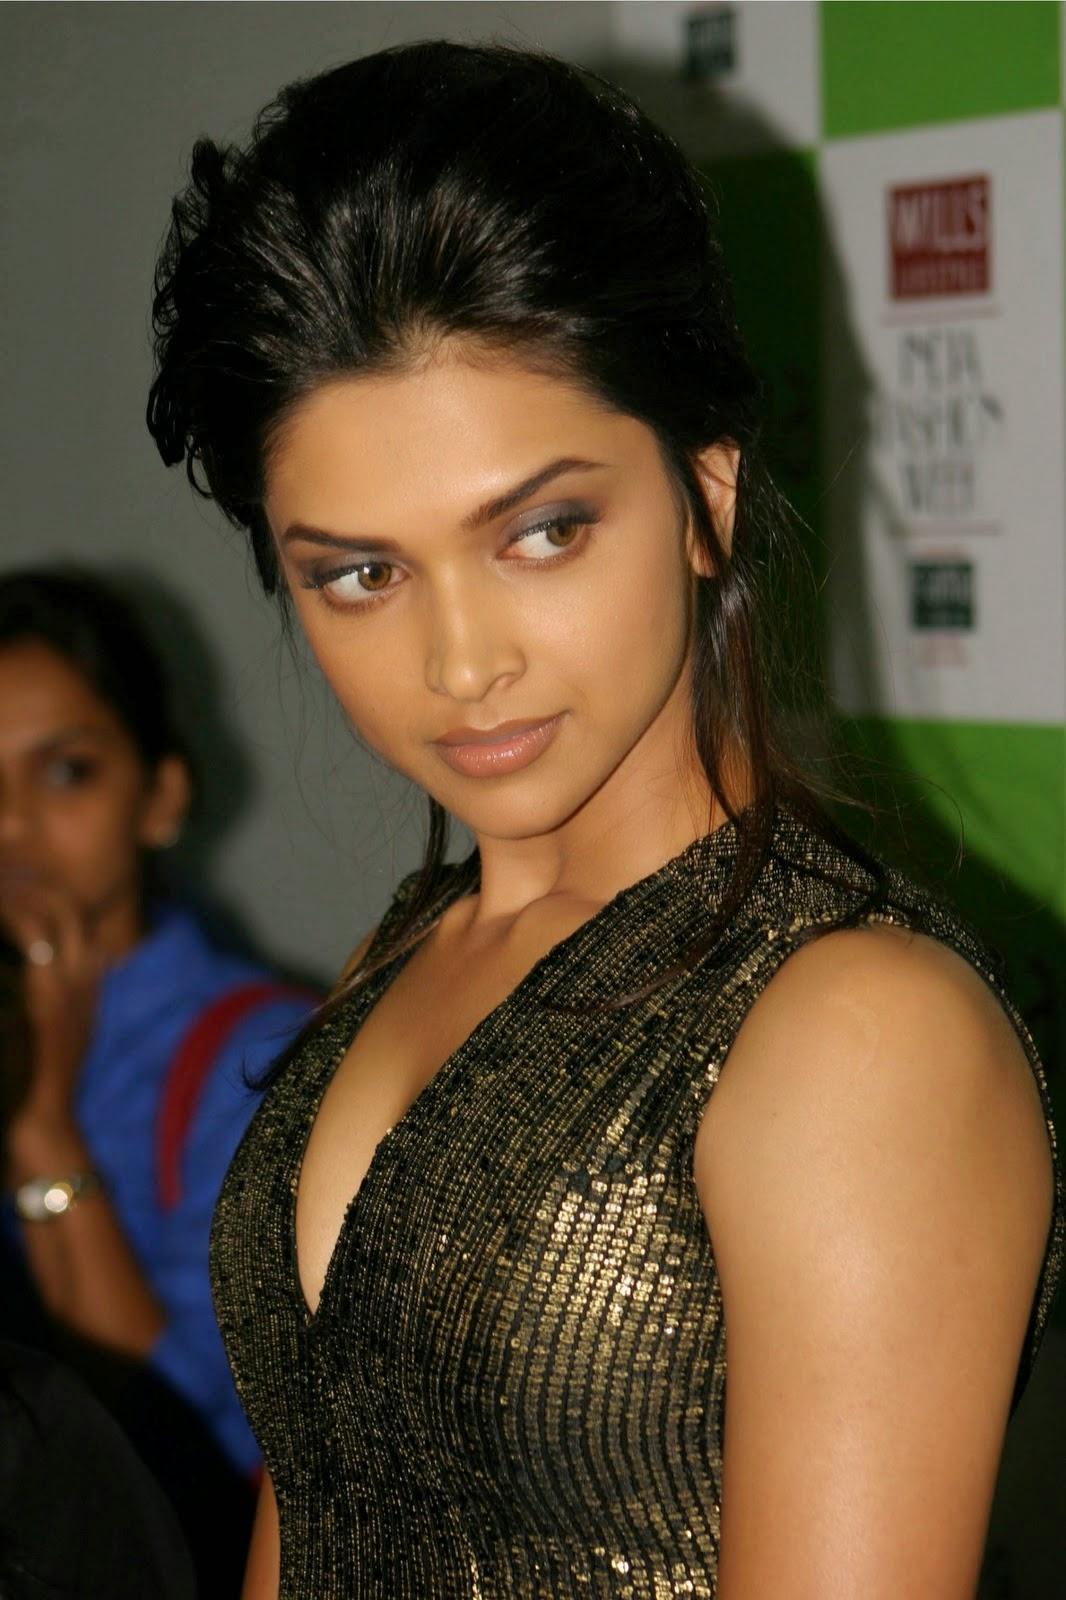 Deepika Padukone in Glittery Black Dress